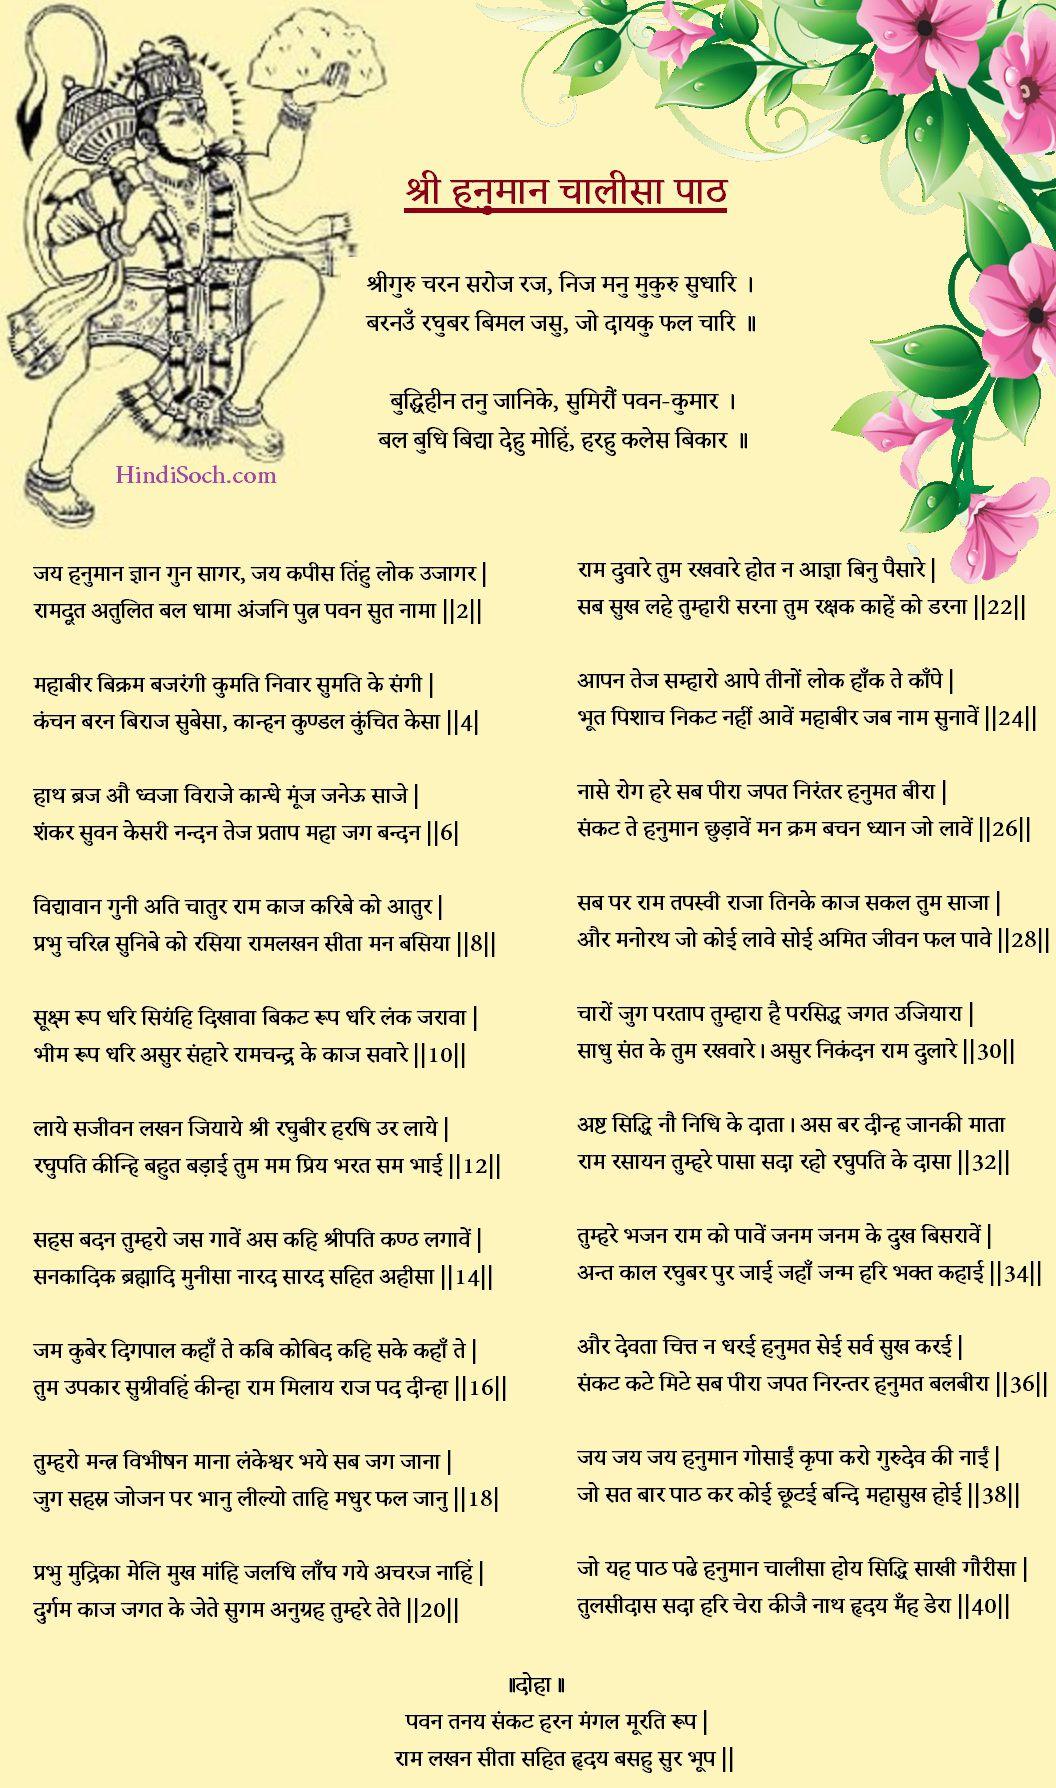 Shree Hanuman Chalisa Image